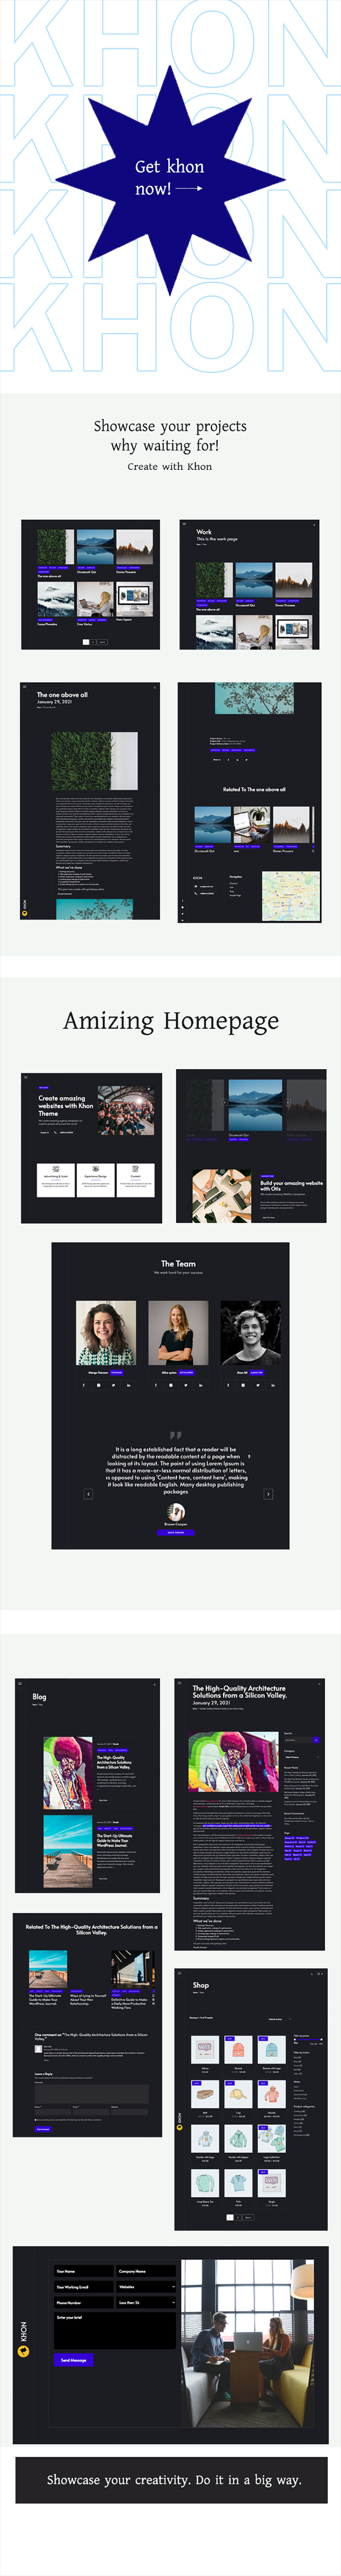 Khon - Creative Agency WordPress Theme - Features Image 1